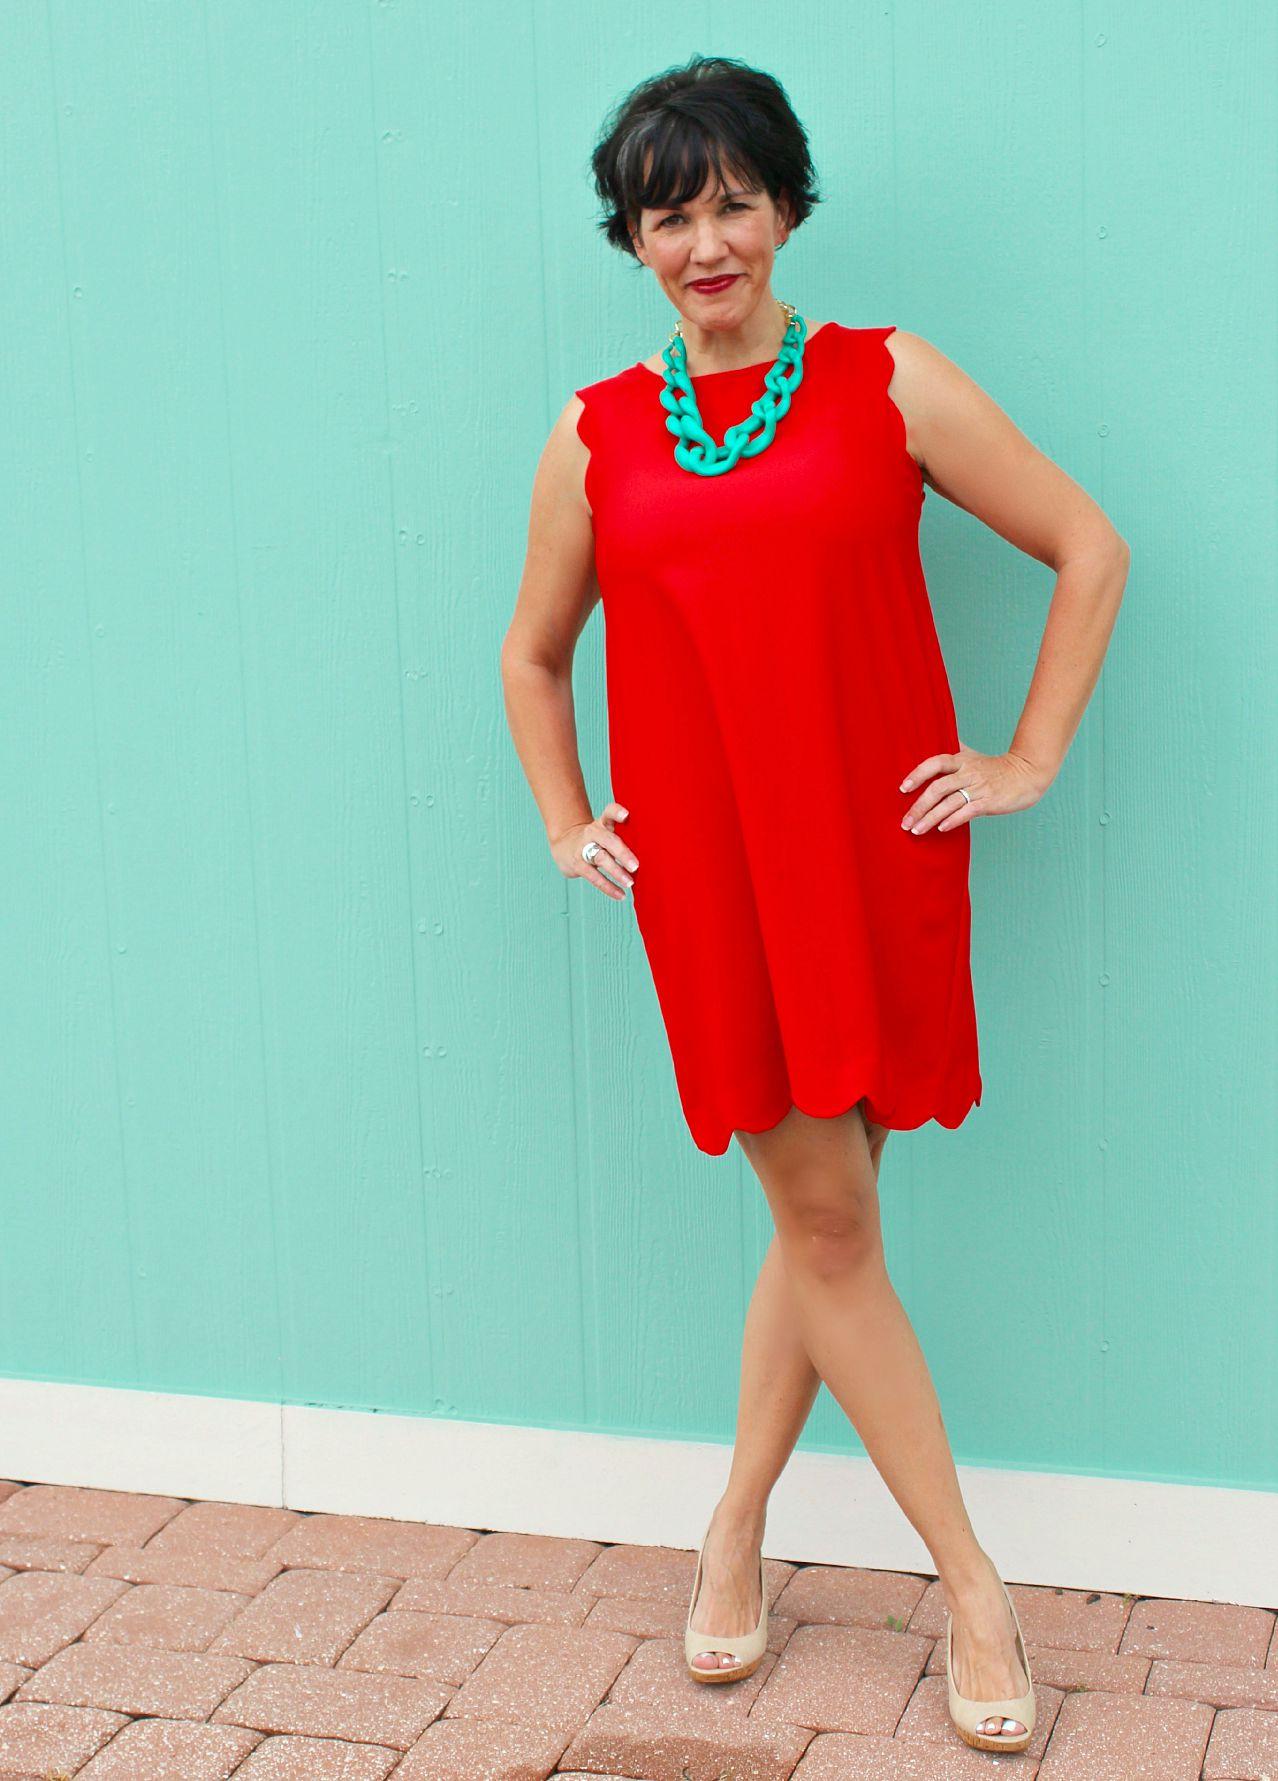 Comfortable Cocktail Red Dress Images - Wedding Ideas - memiocall.com